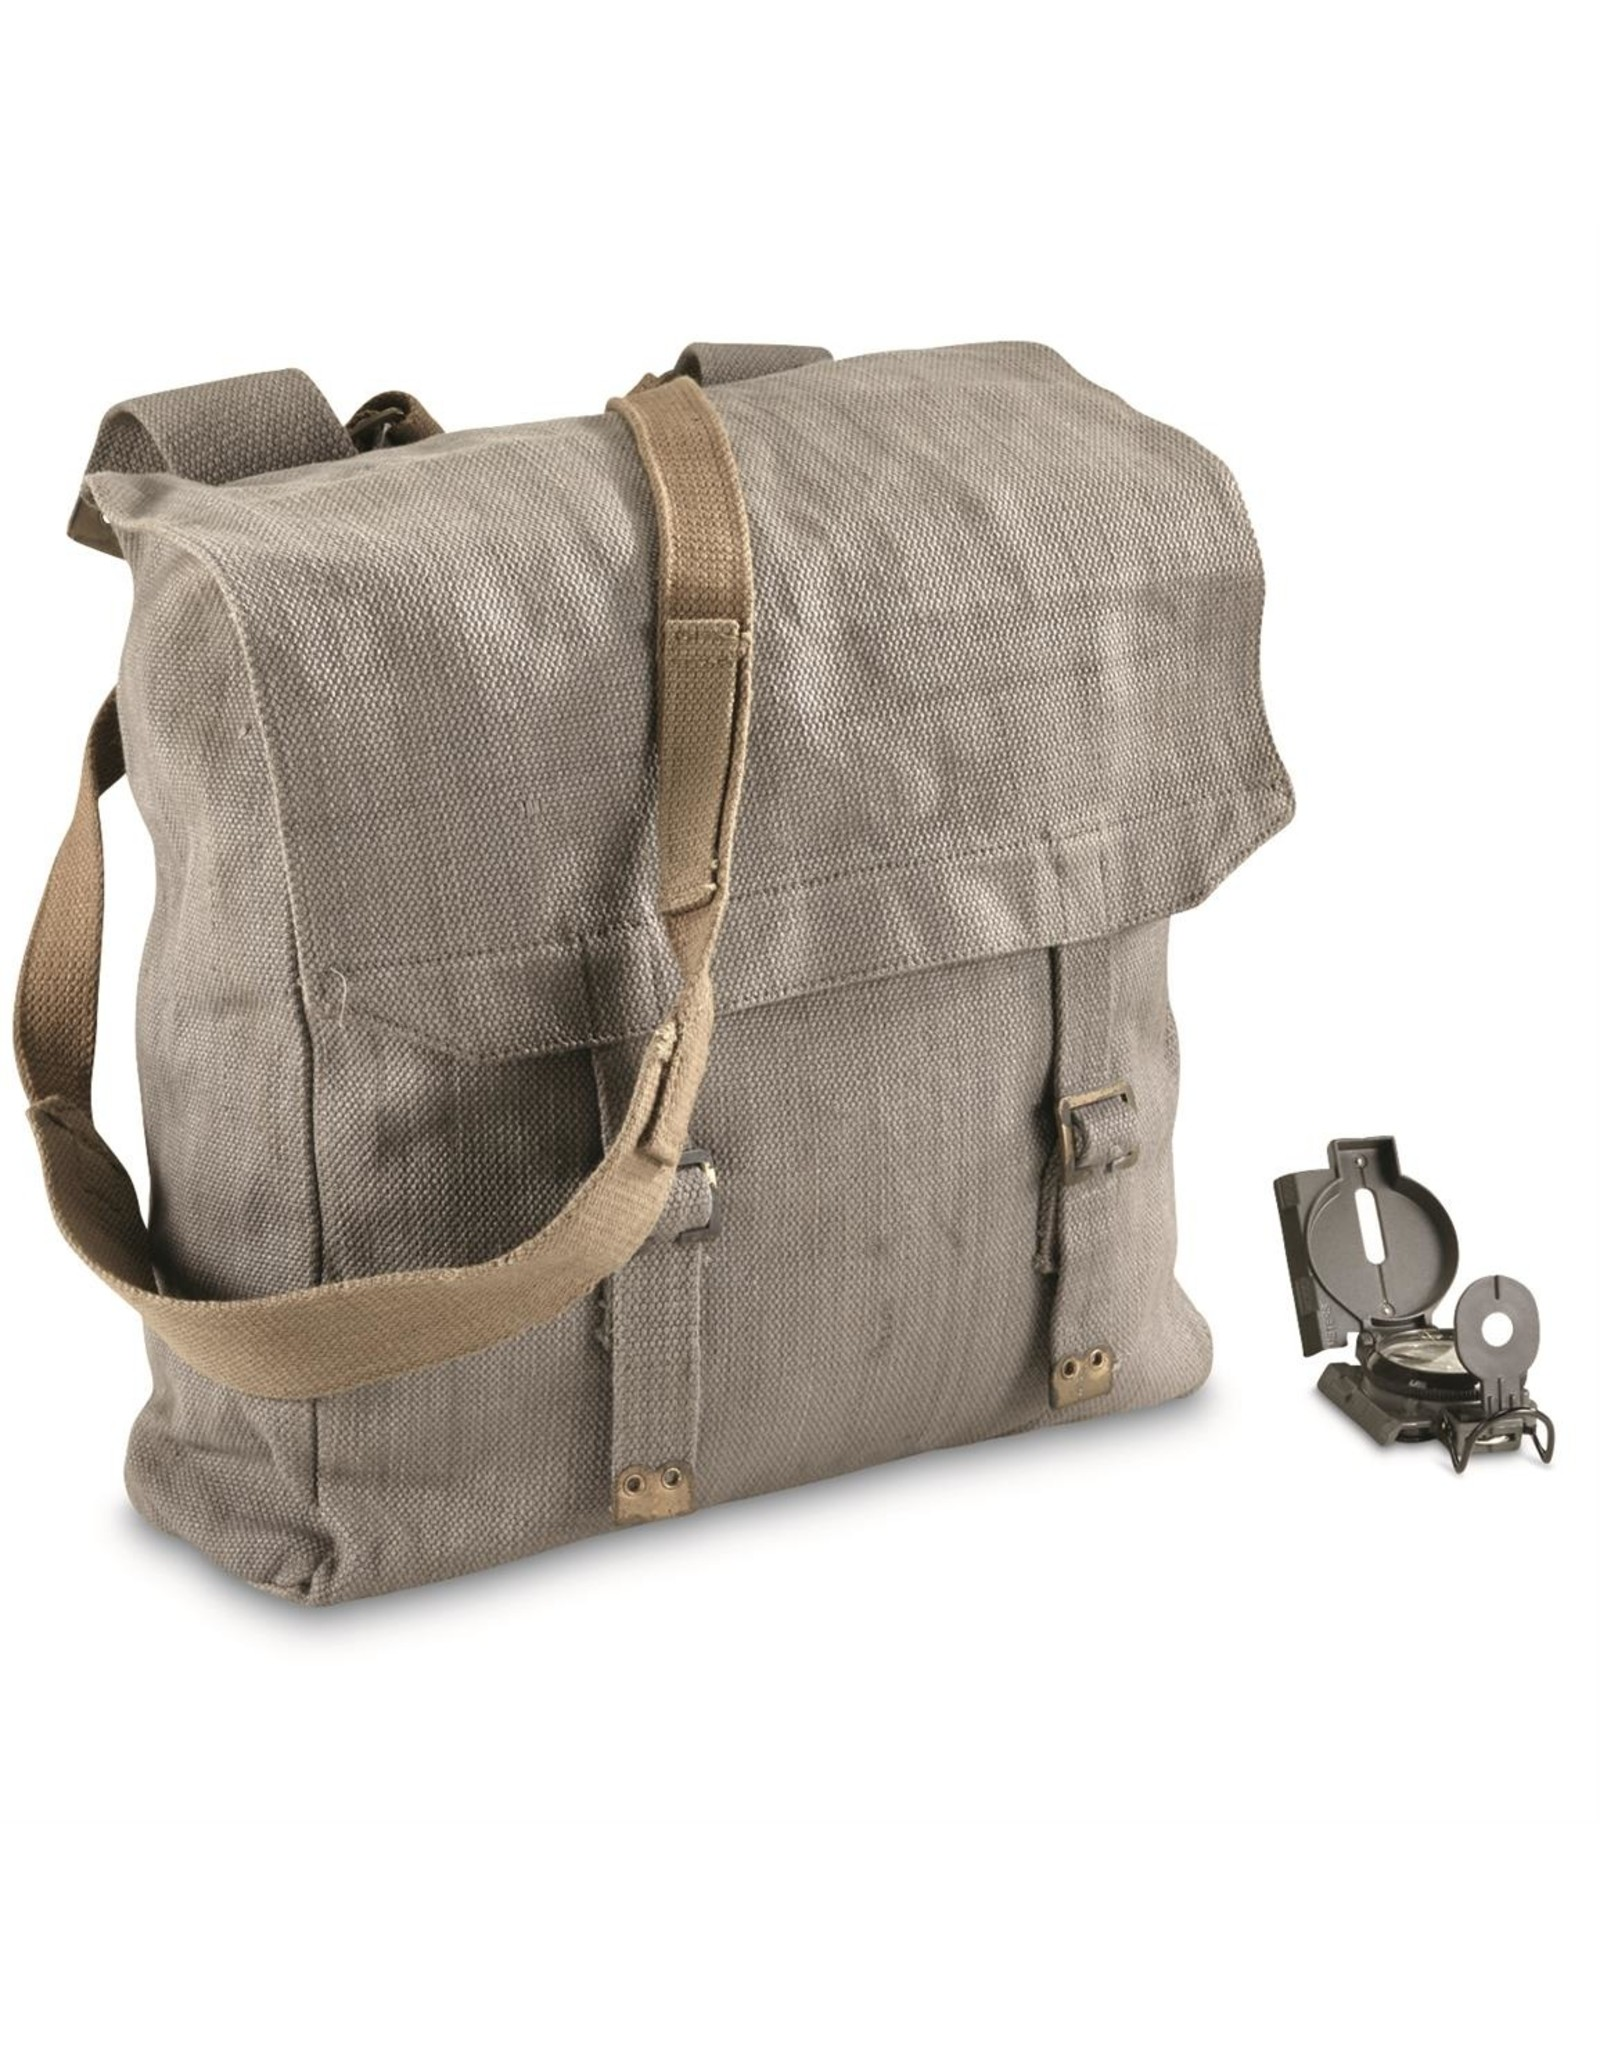 STURM MILSPEC BRITISH GREY M37 LARGE PACK